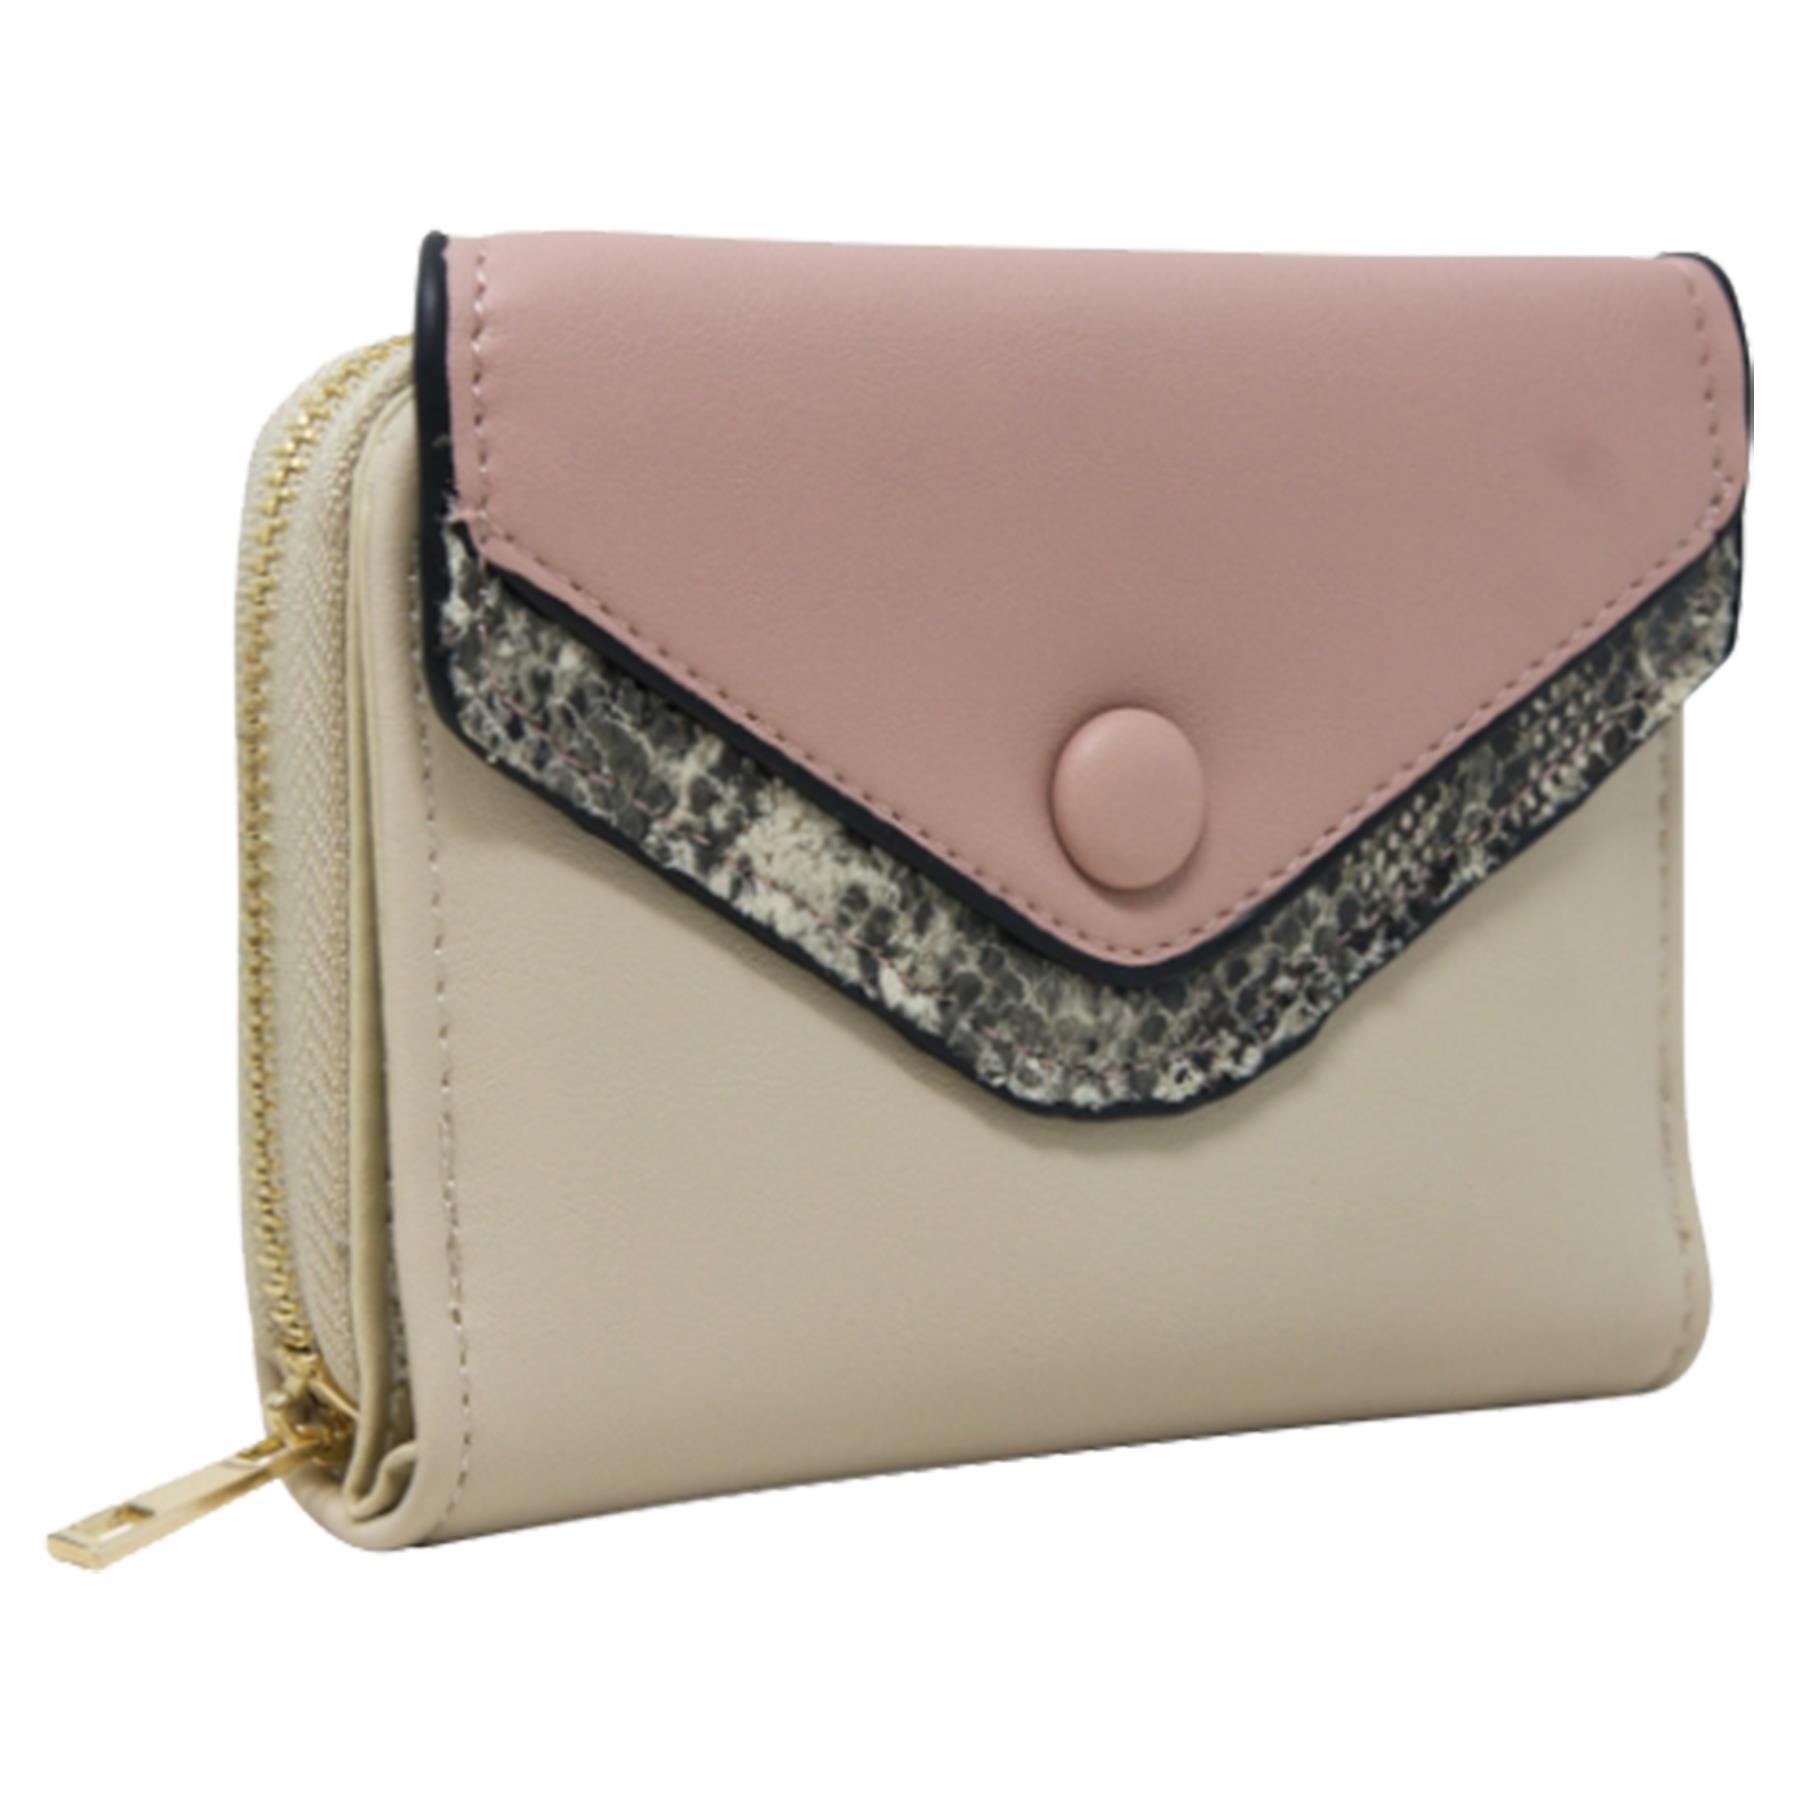 New-Ladies-Multicoloured-Envelope-Faux-Leather-Reptile-Detail-Purse thumbnail 3